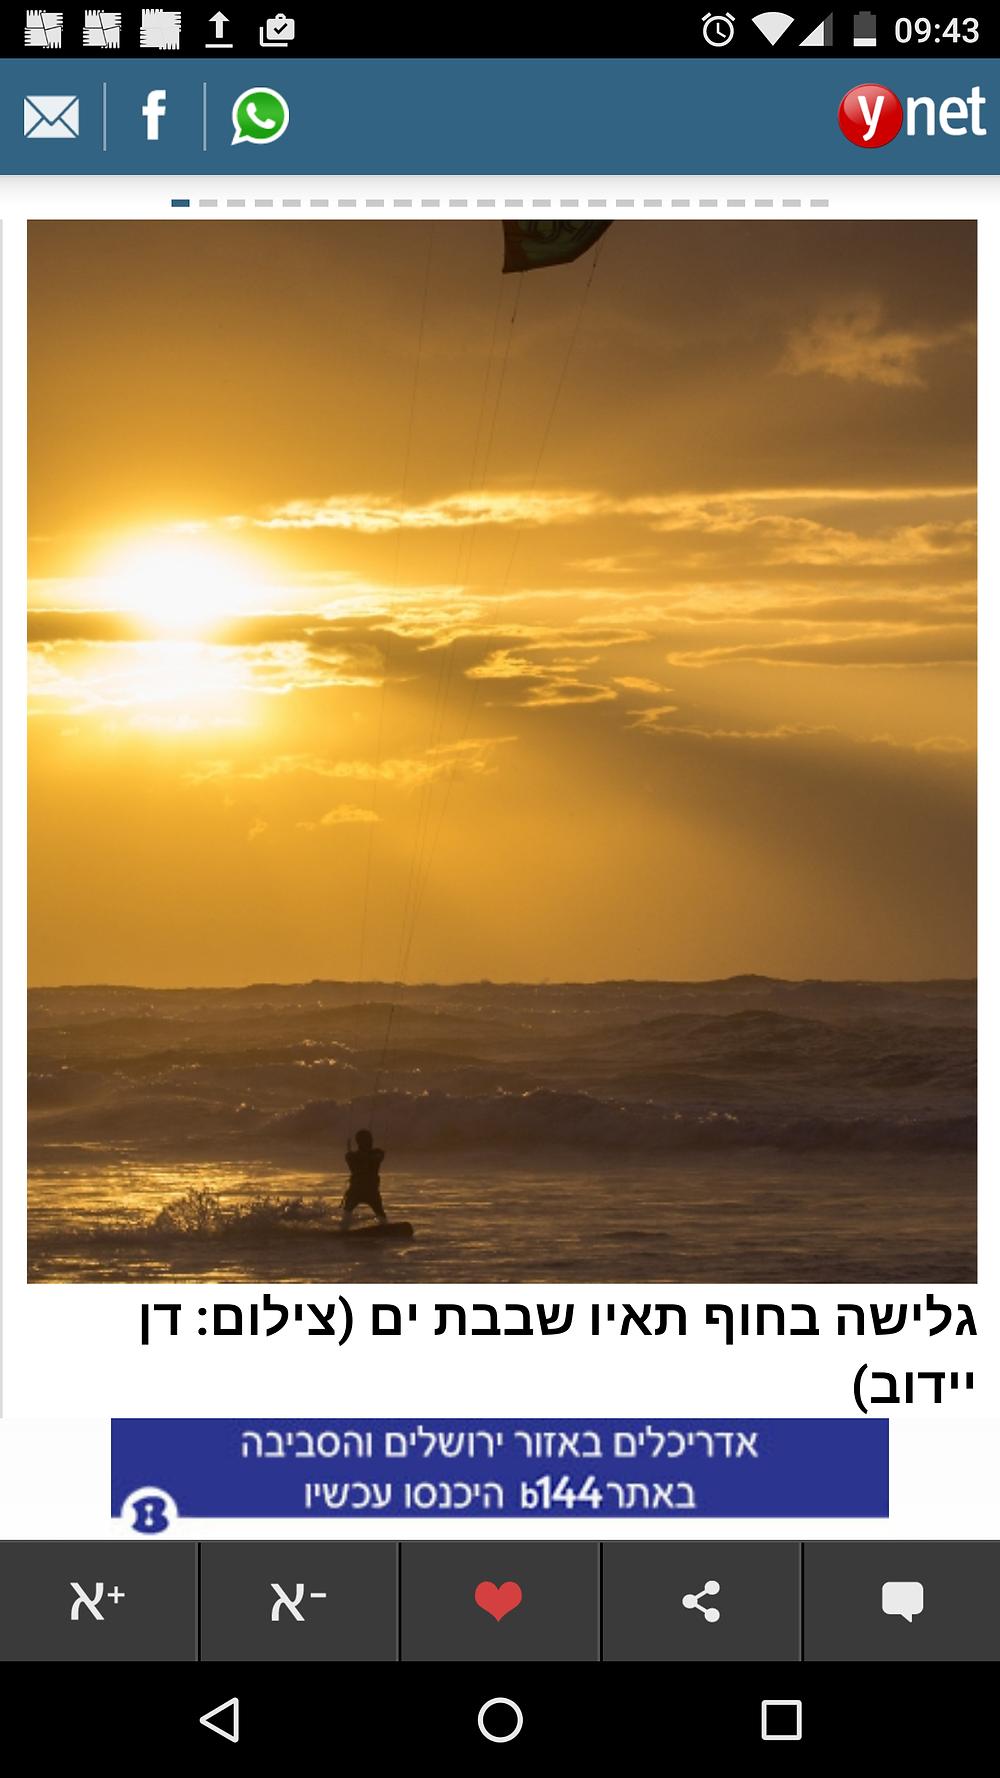 Kite surfing מתוך אתר ynet